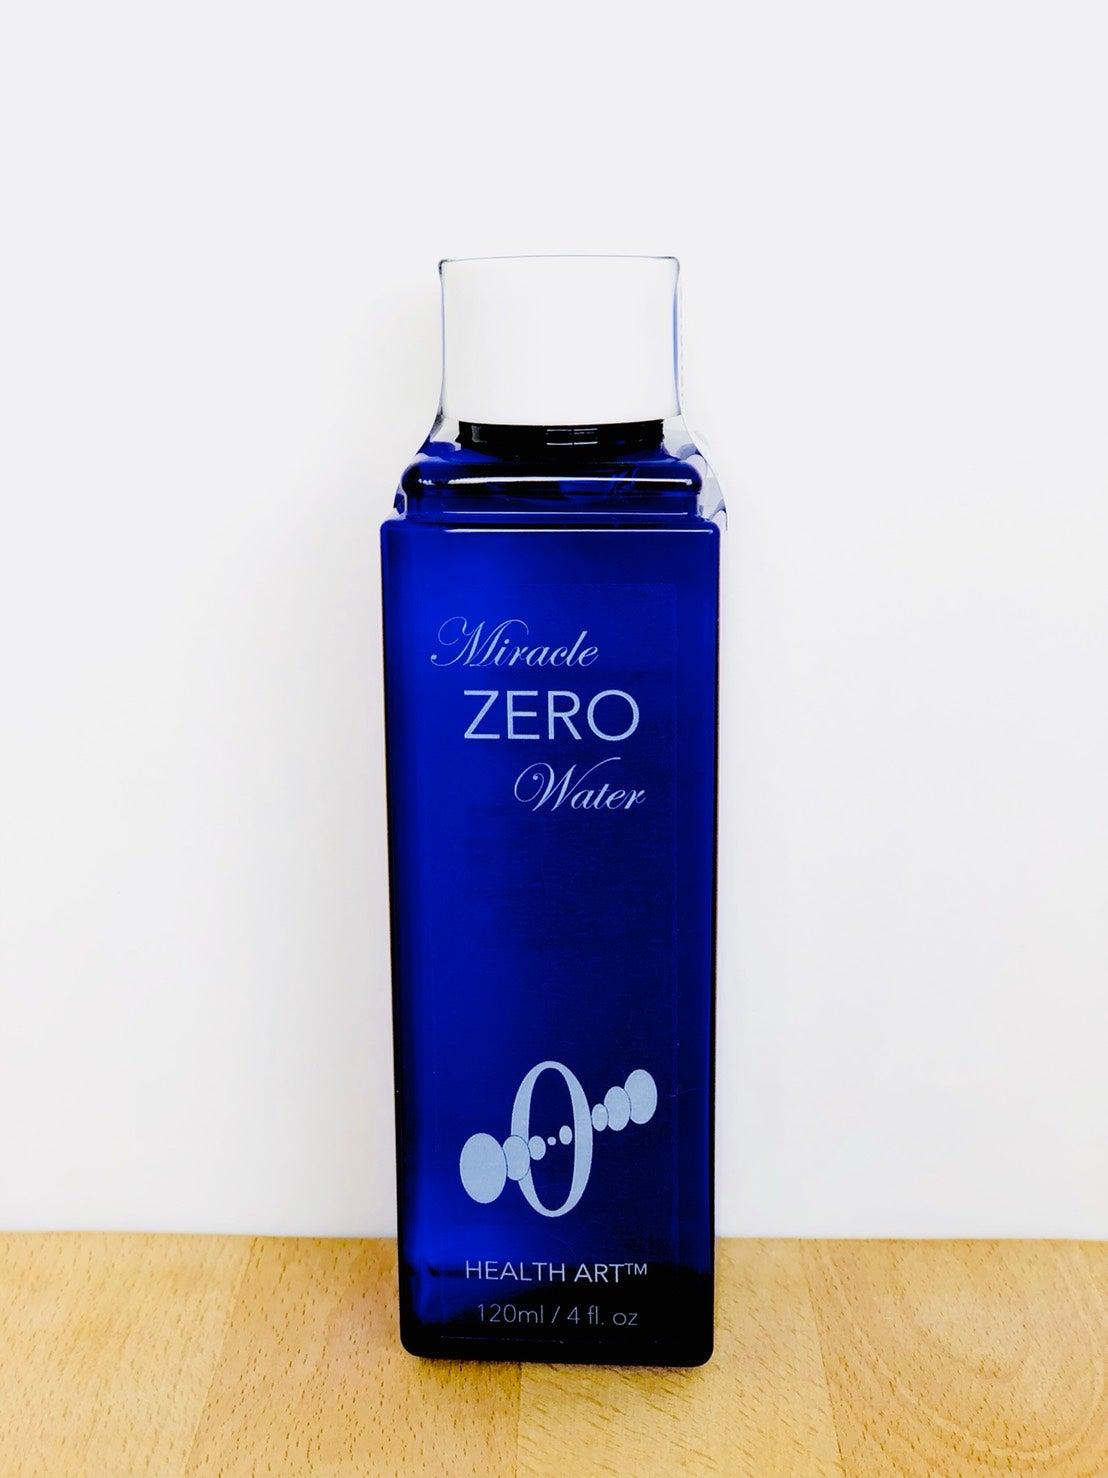 Miracle ZERO Water ② もう少し詳しく...